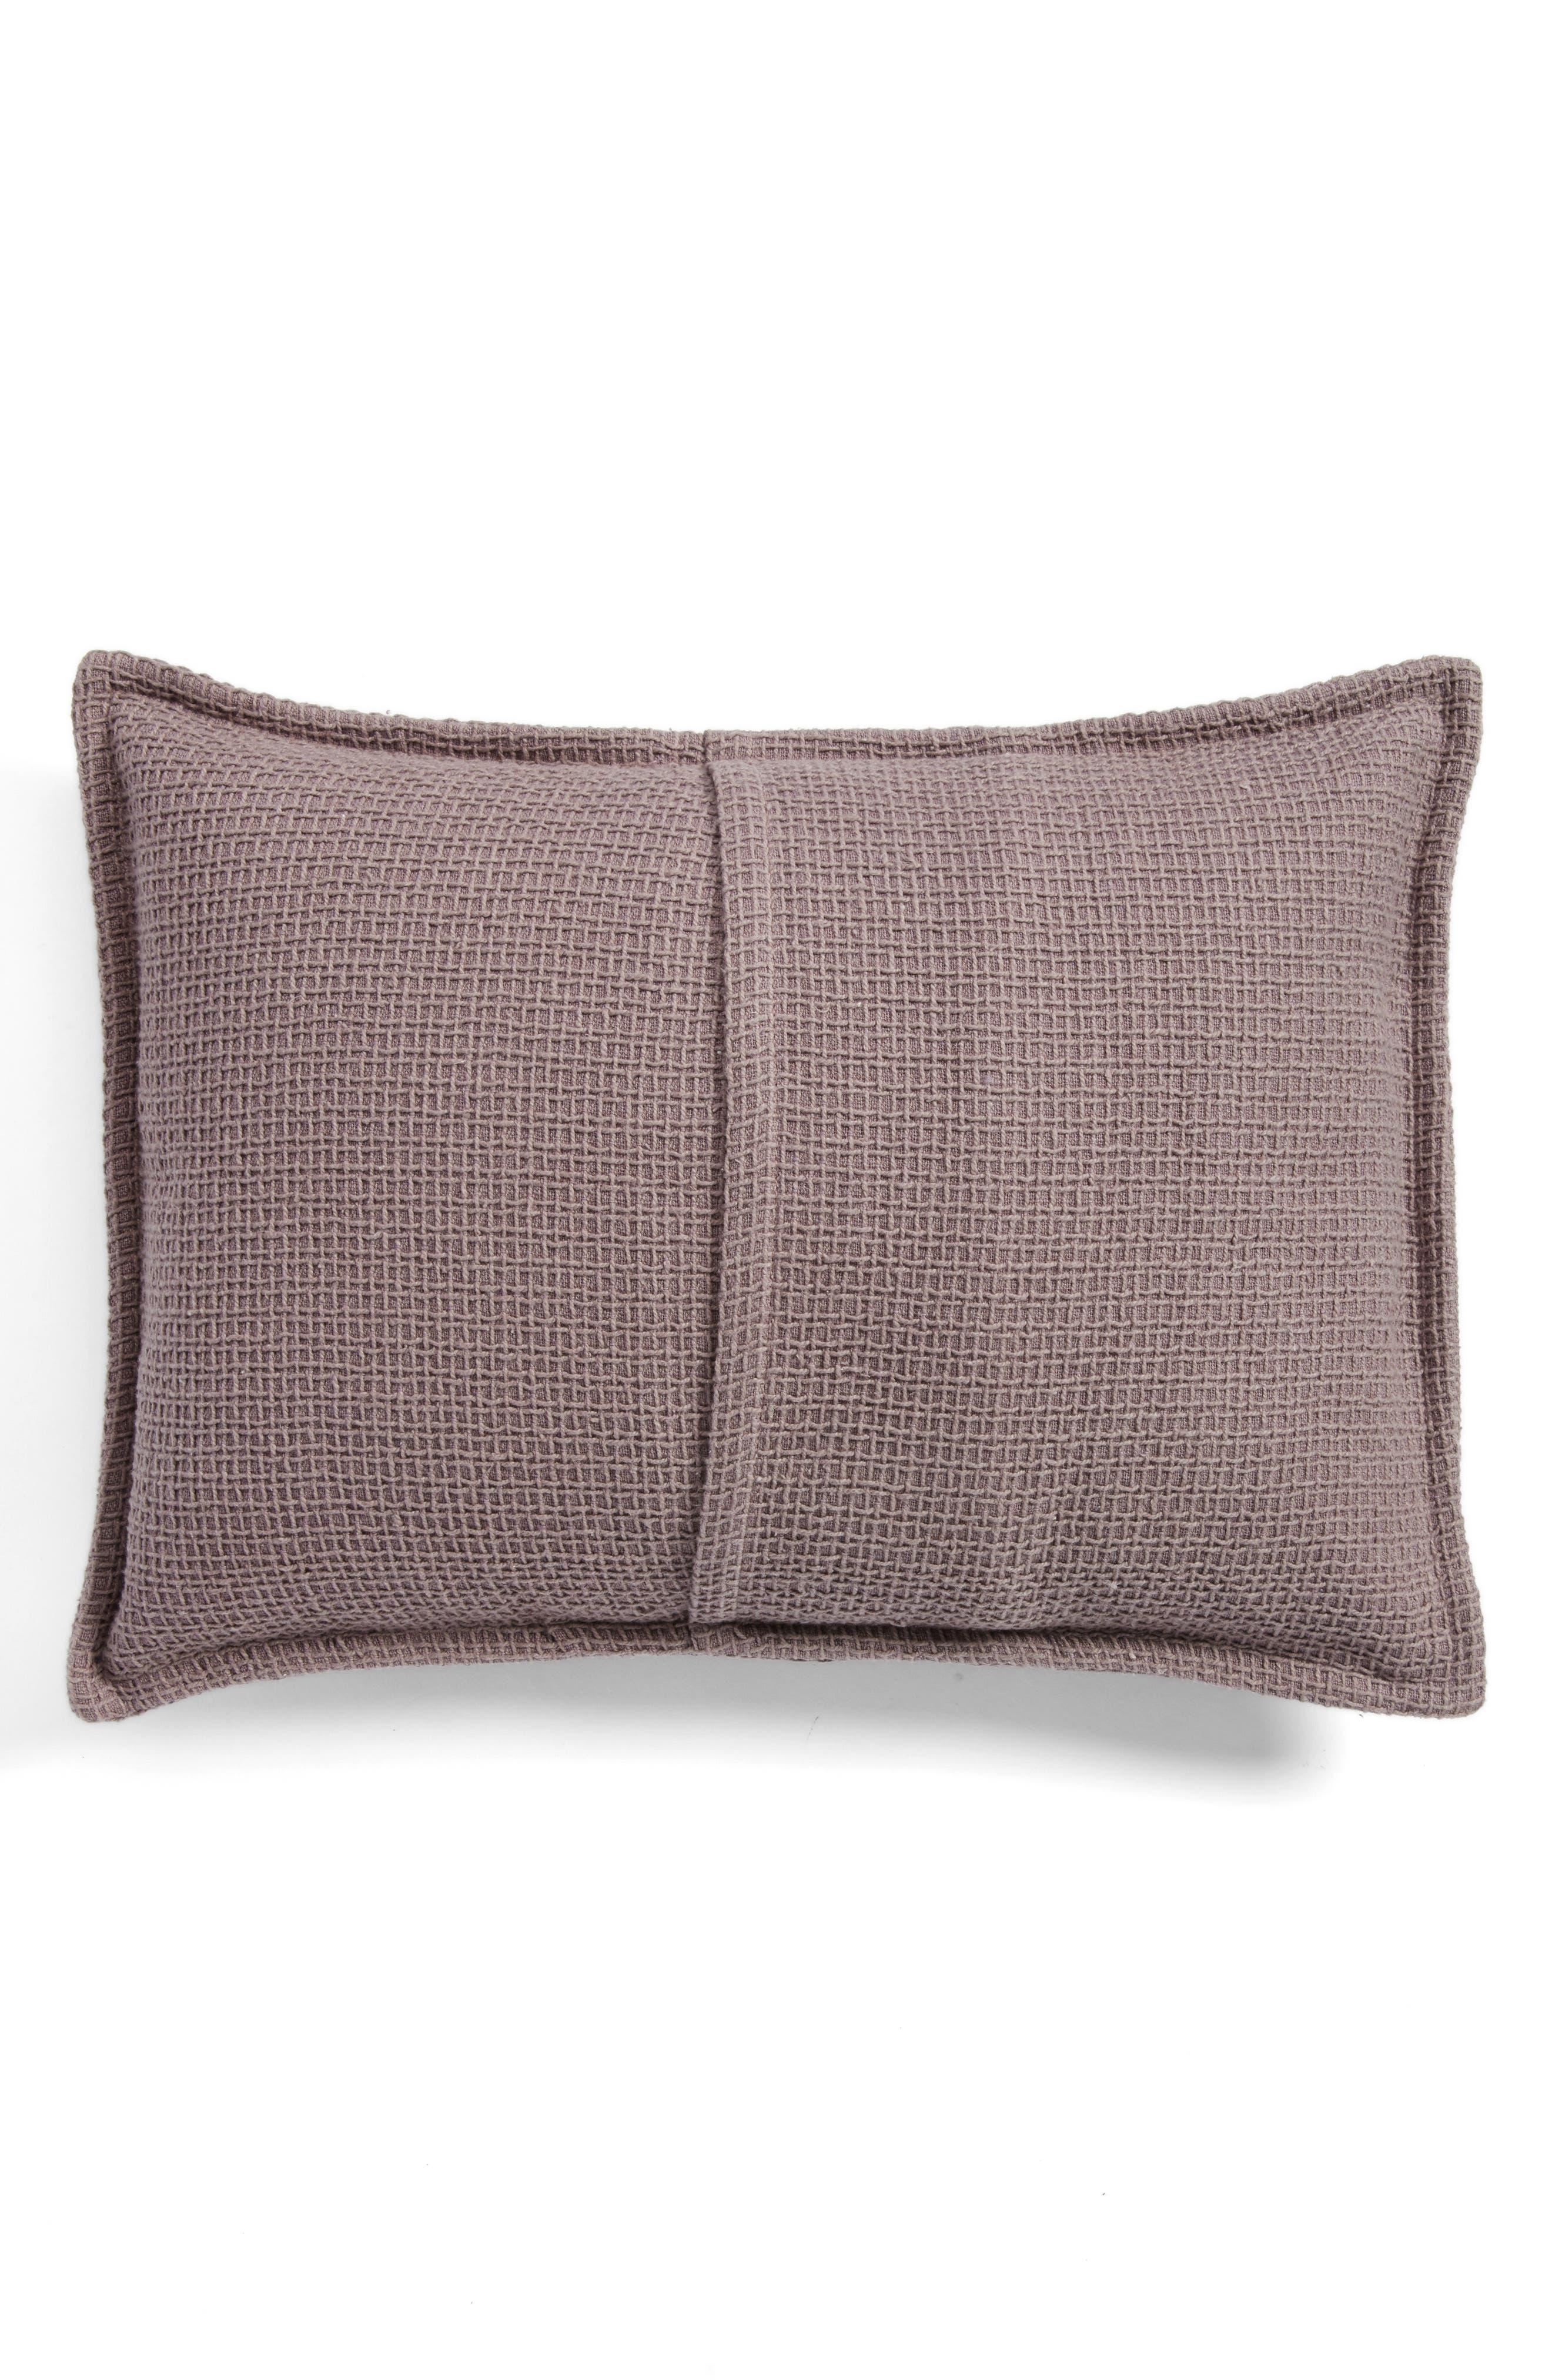 Floral Jacquard Breakfast Pillow,                             Alternate thumbnail 4, color,